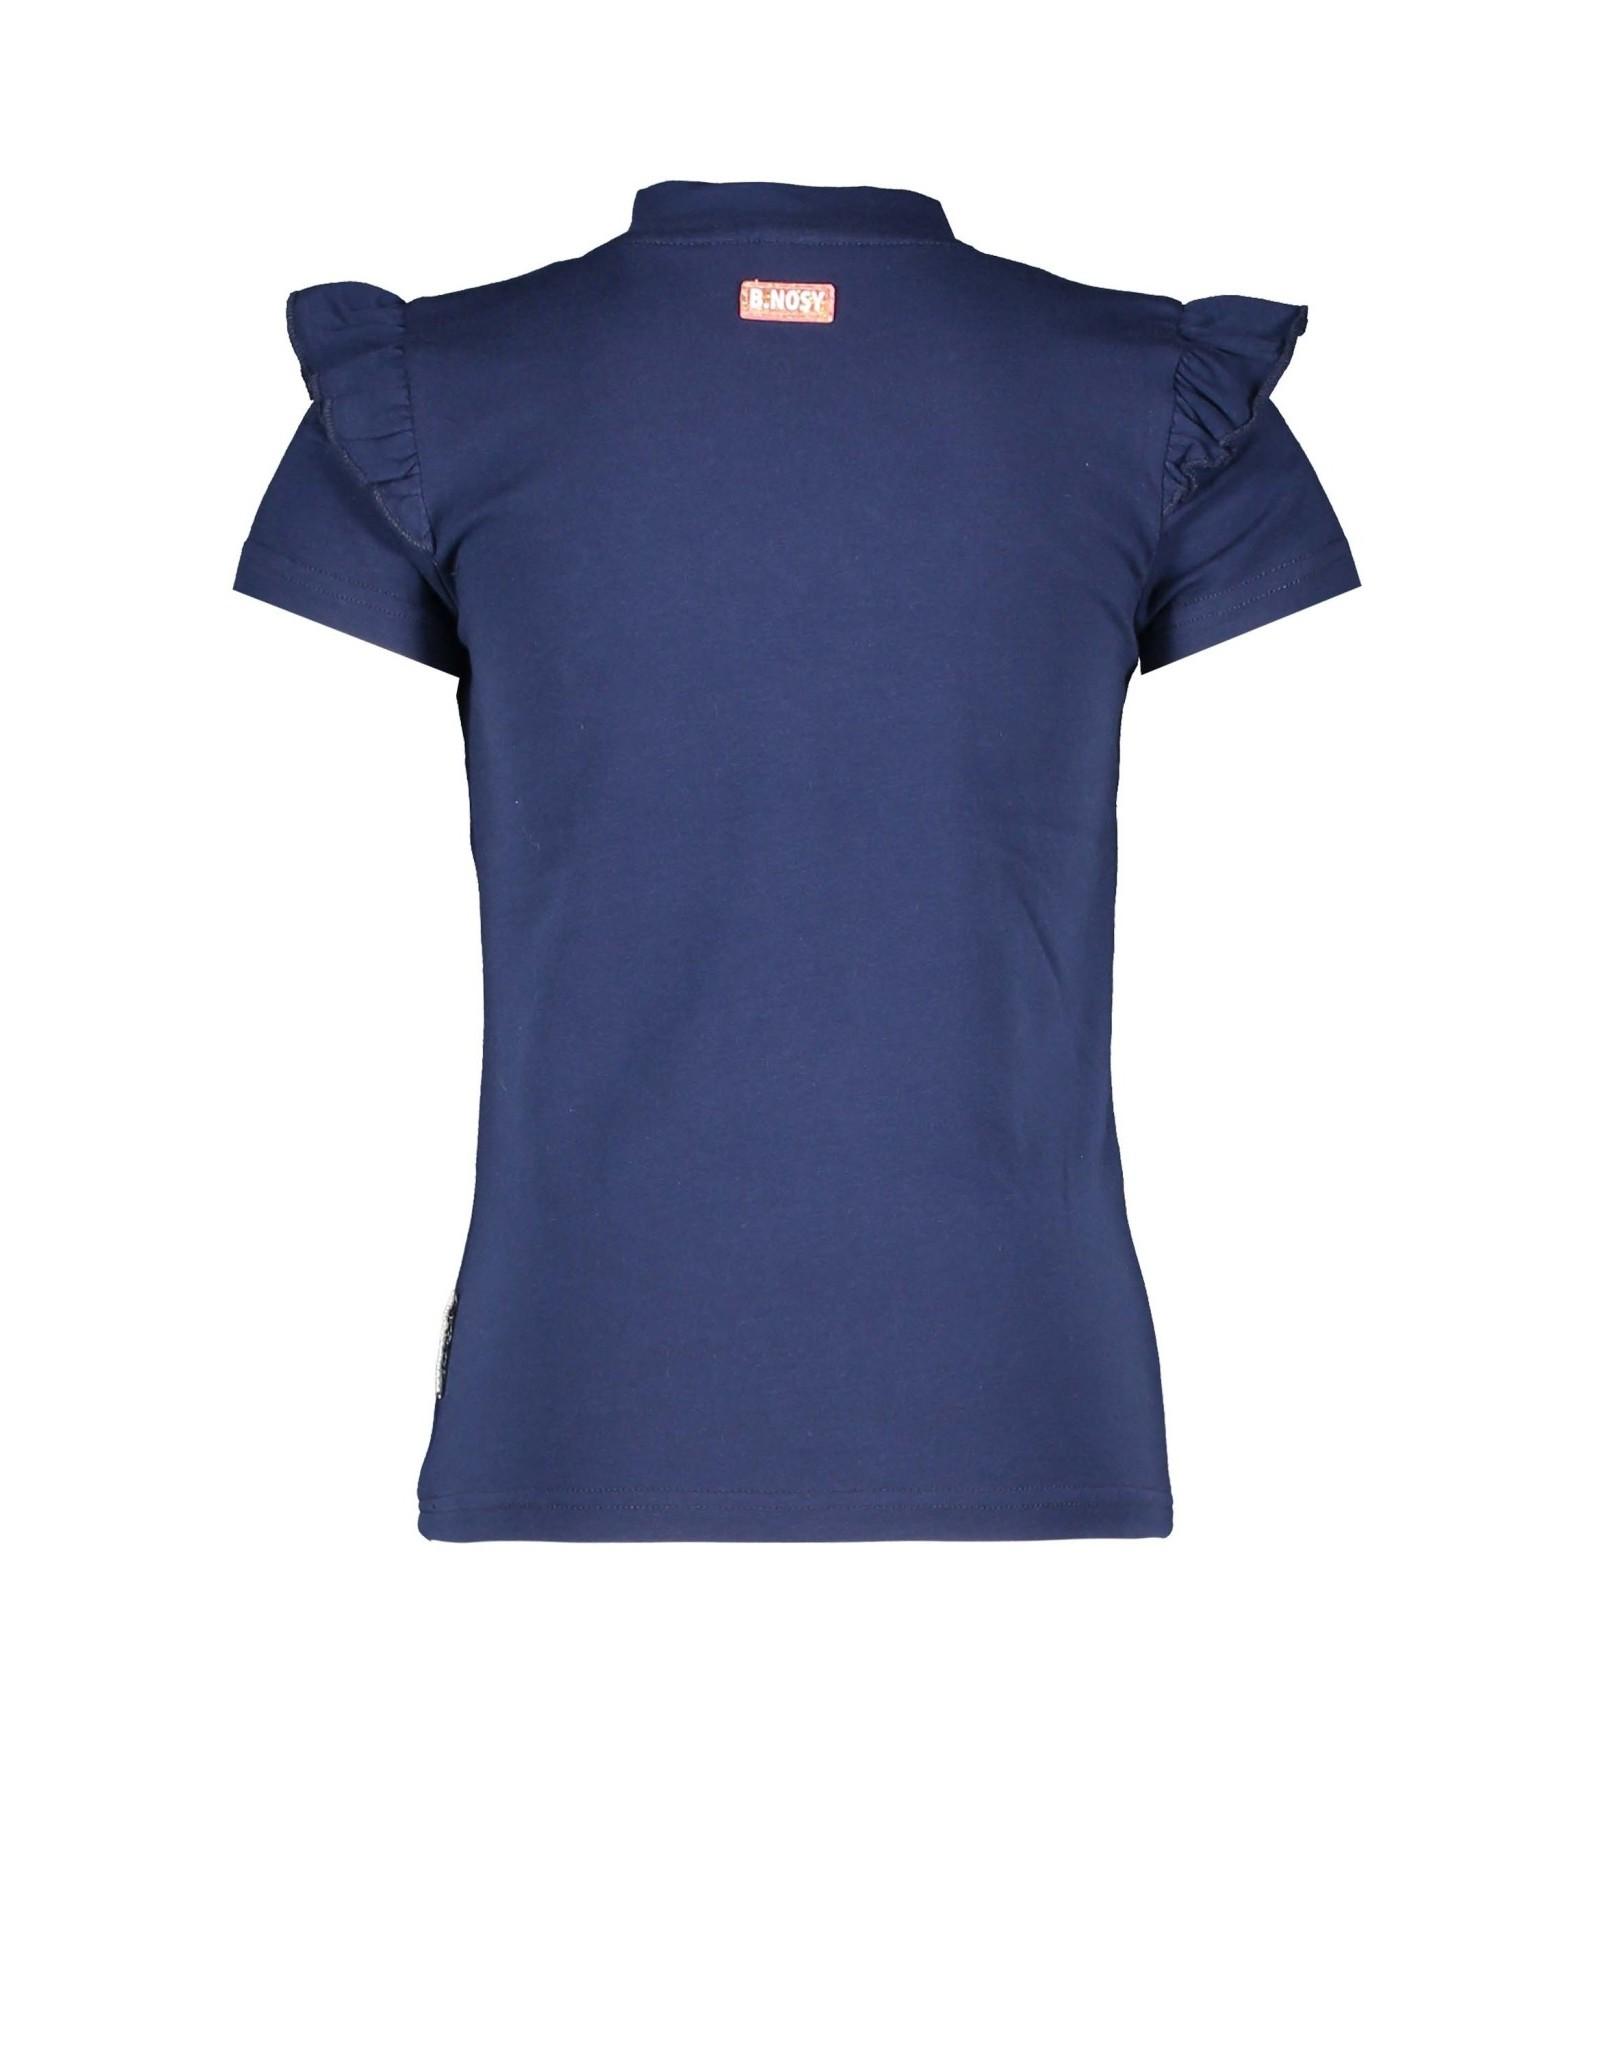 B.Nosy B.Nosy meisjes t-shirt met borduurprint Space Blue